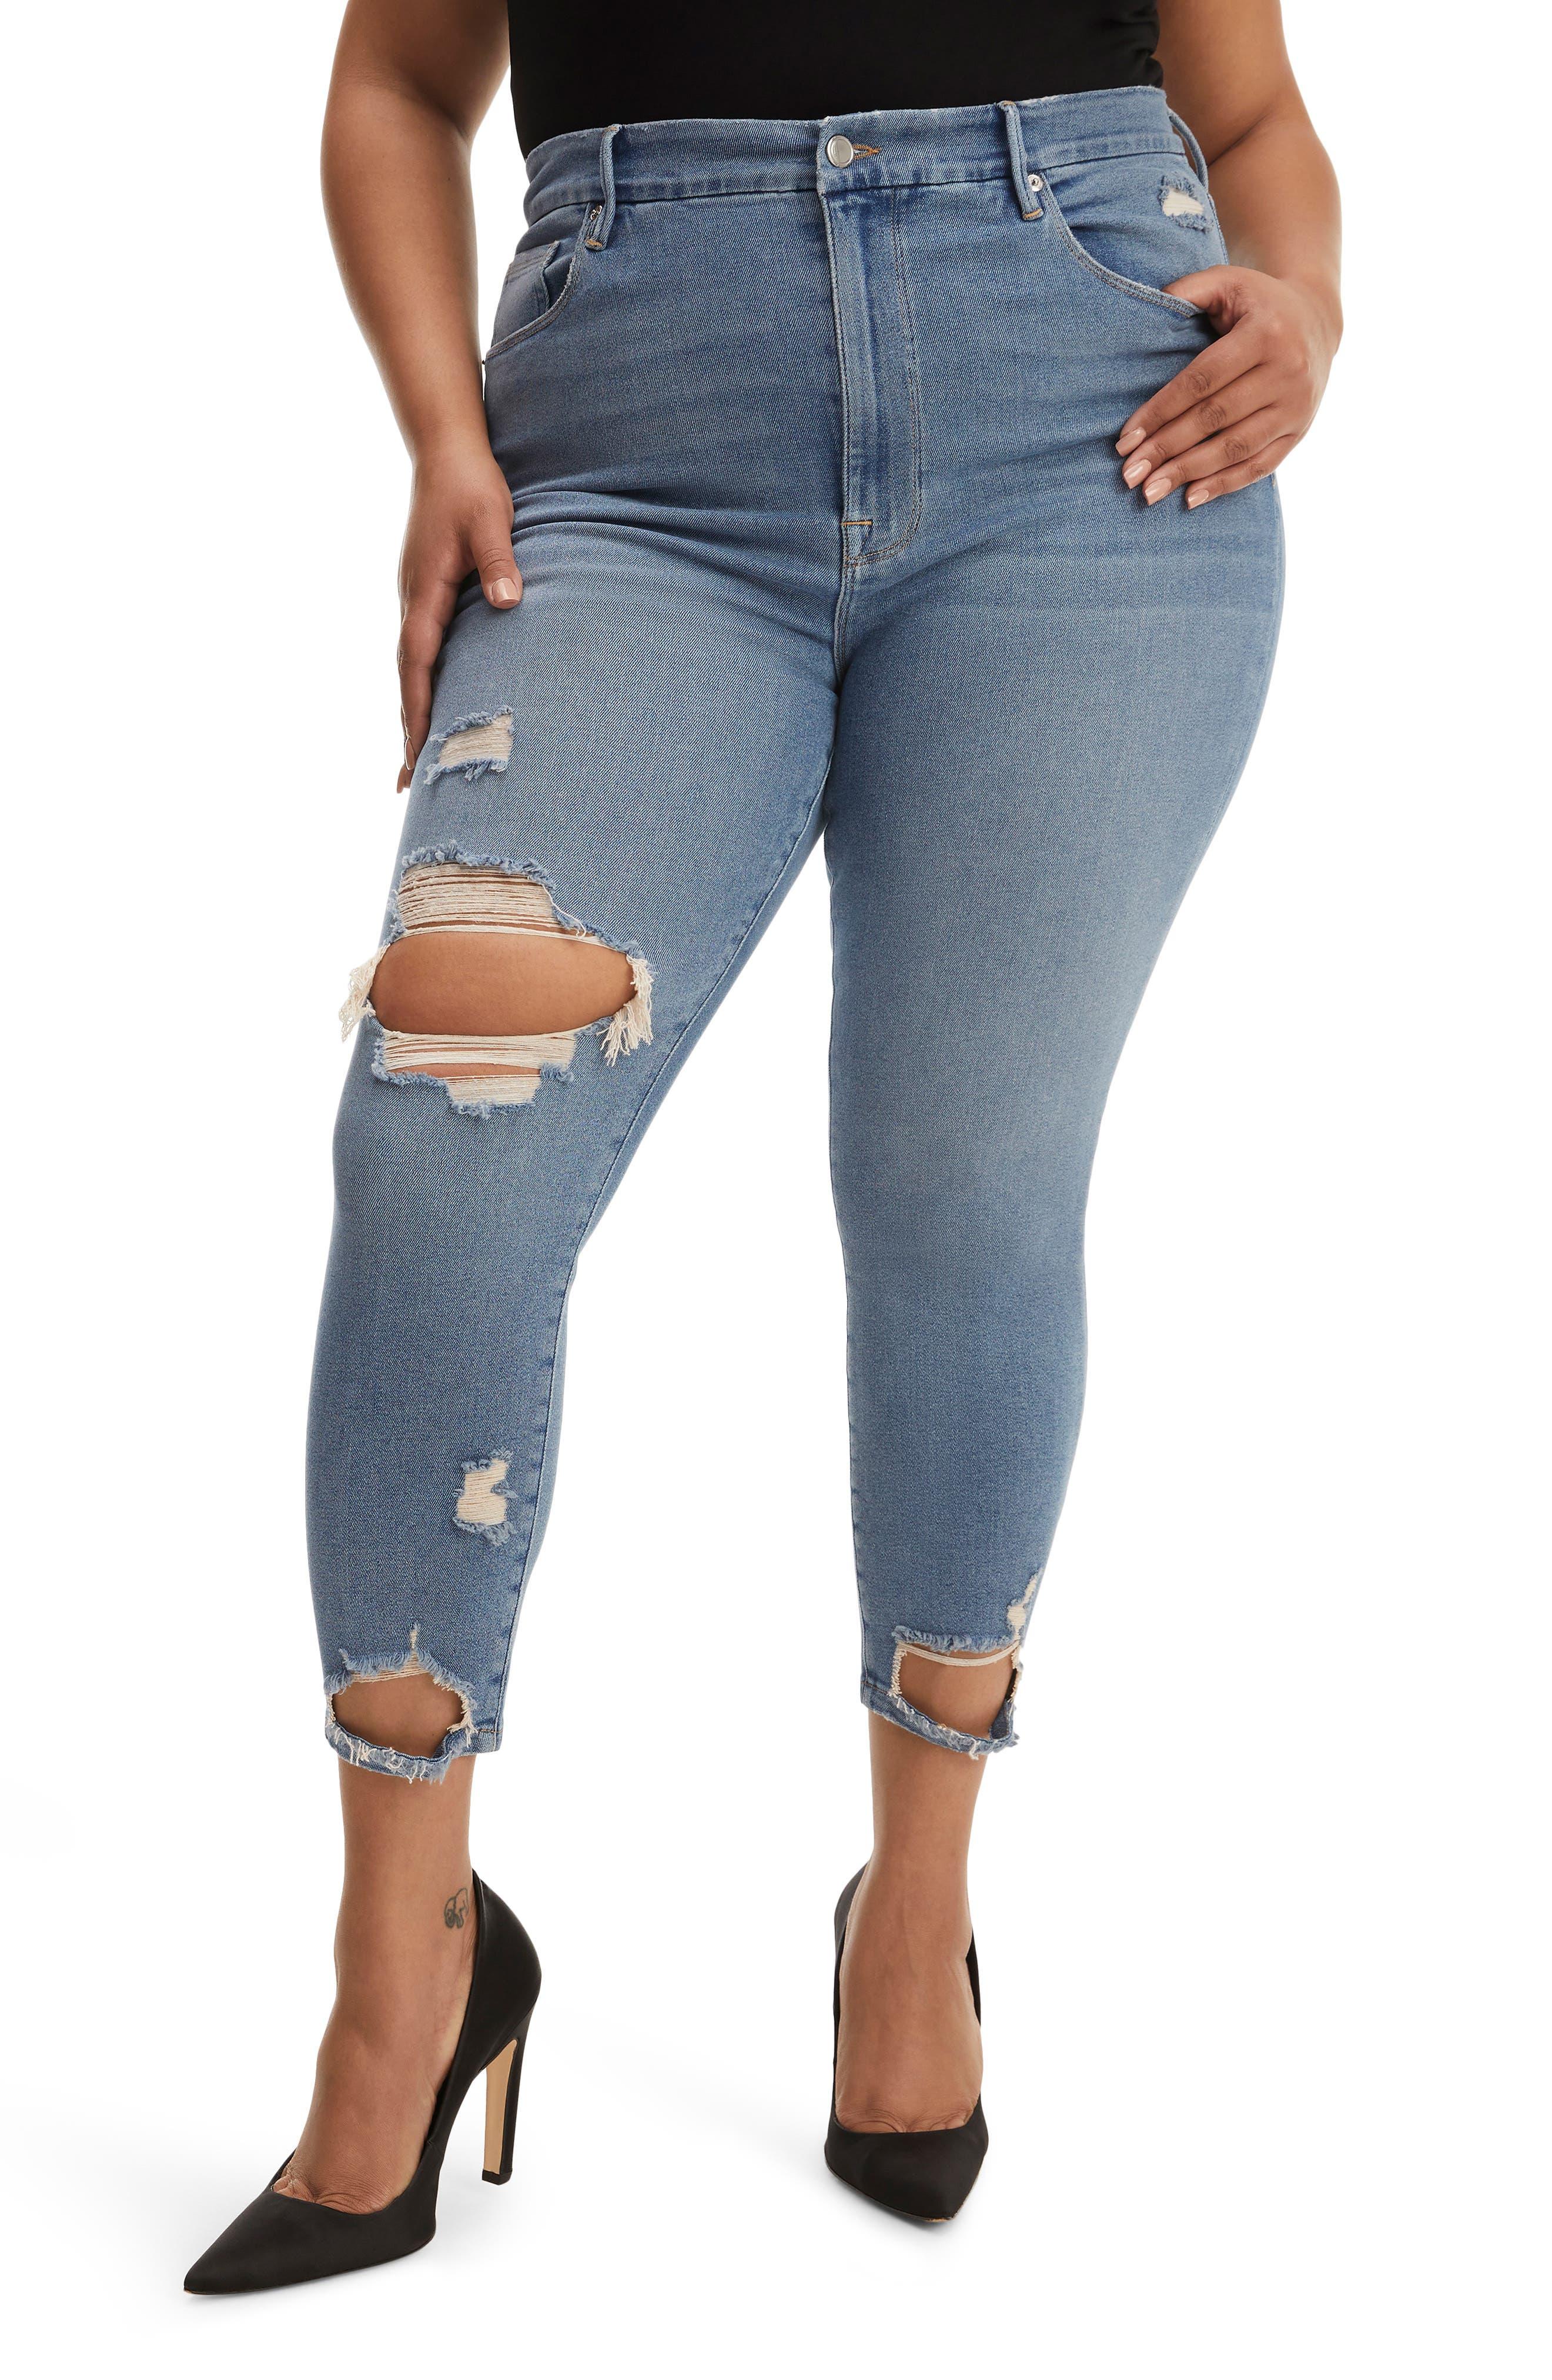 Plus Women's Good American Good Waist Ripped Crop Skinny Jeans